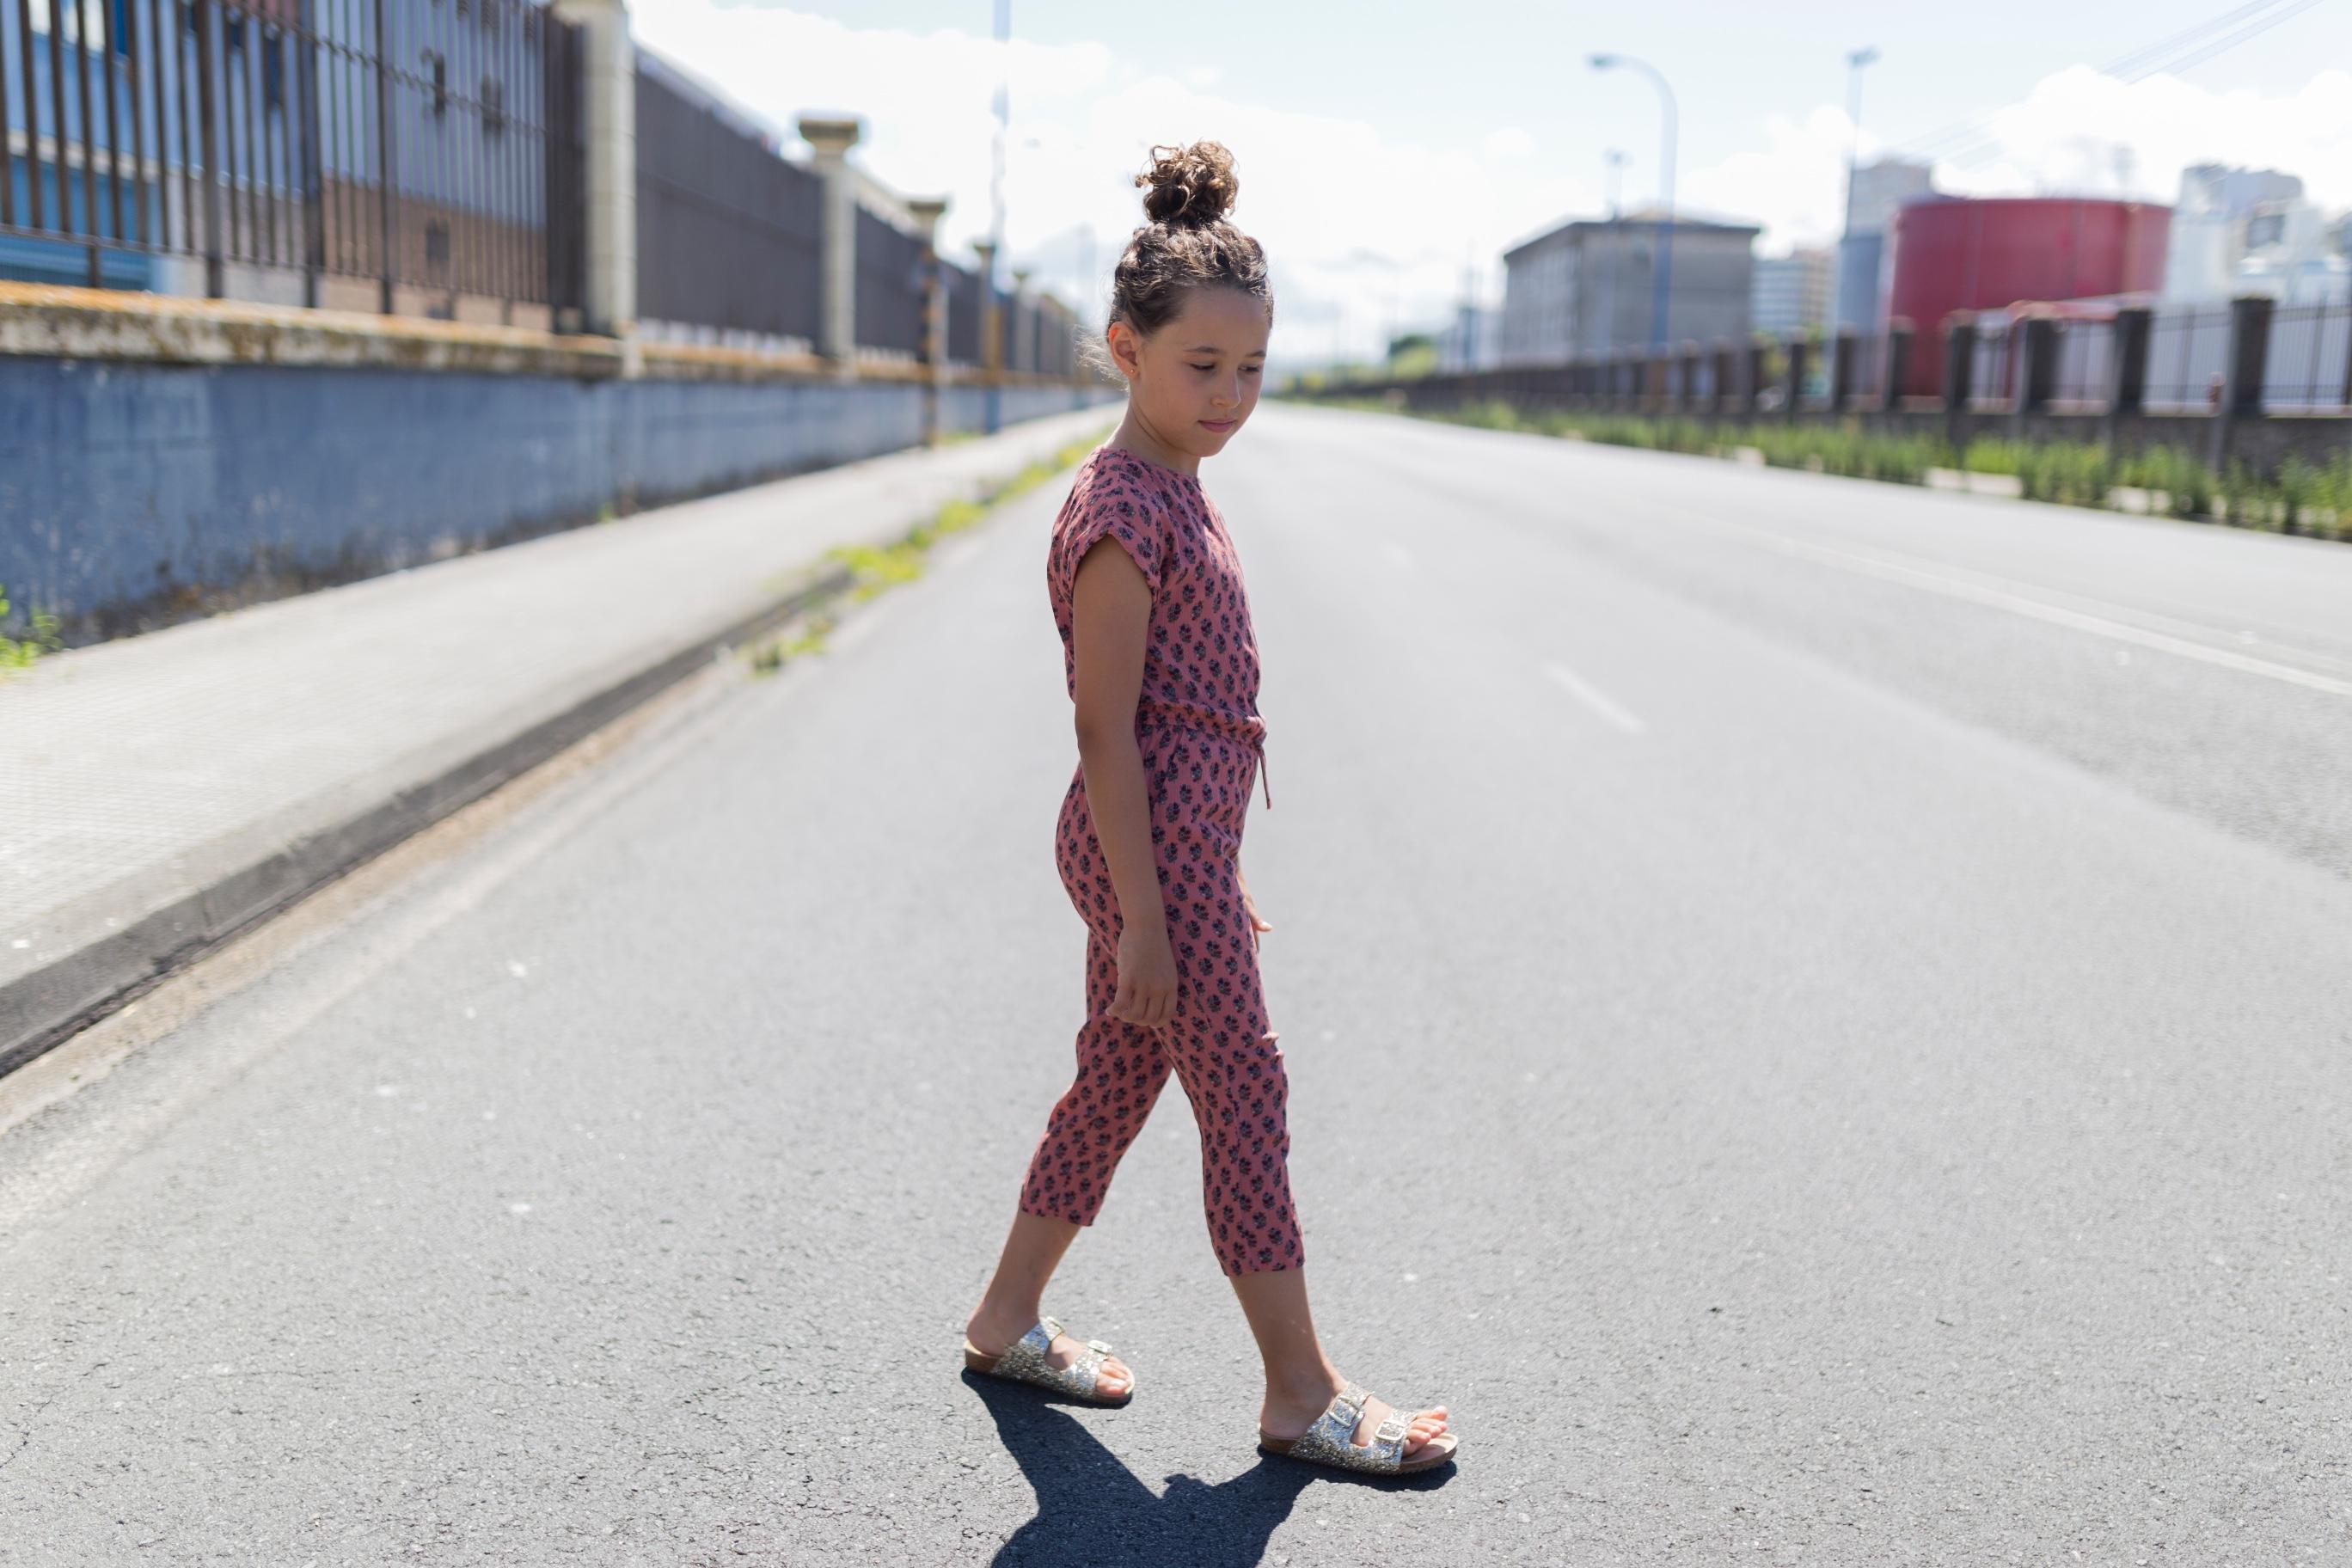 zara kids-zara soft-descalzaporelparque- moda-niños-fashion kids-coruña- jimena look- kids- miniblogger- ministyle- Soft- streetstyle- zara